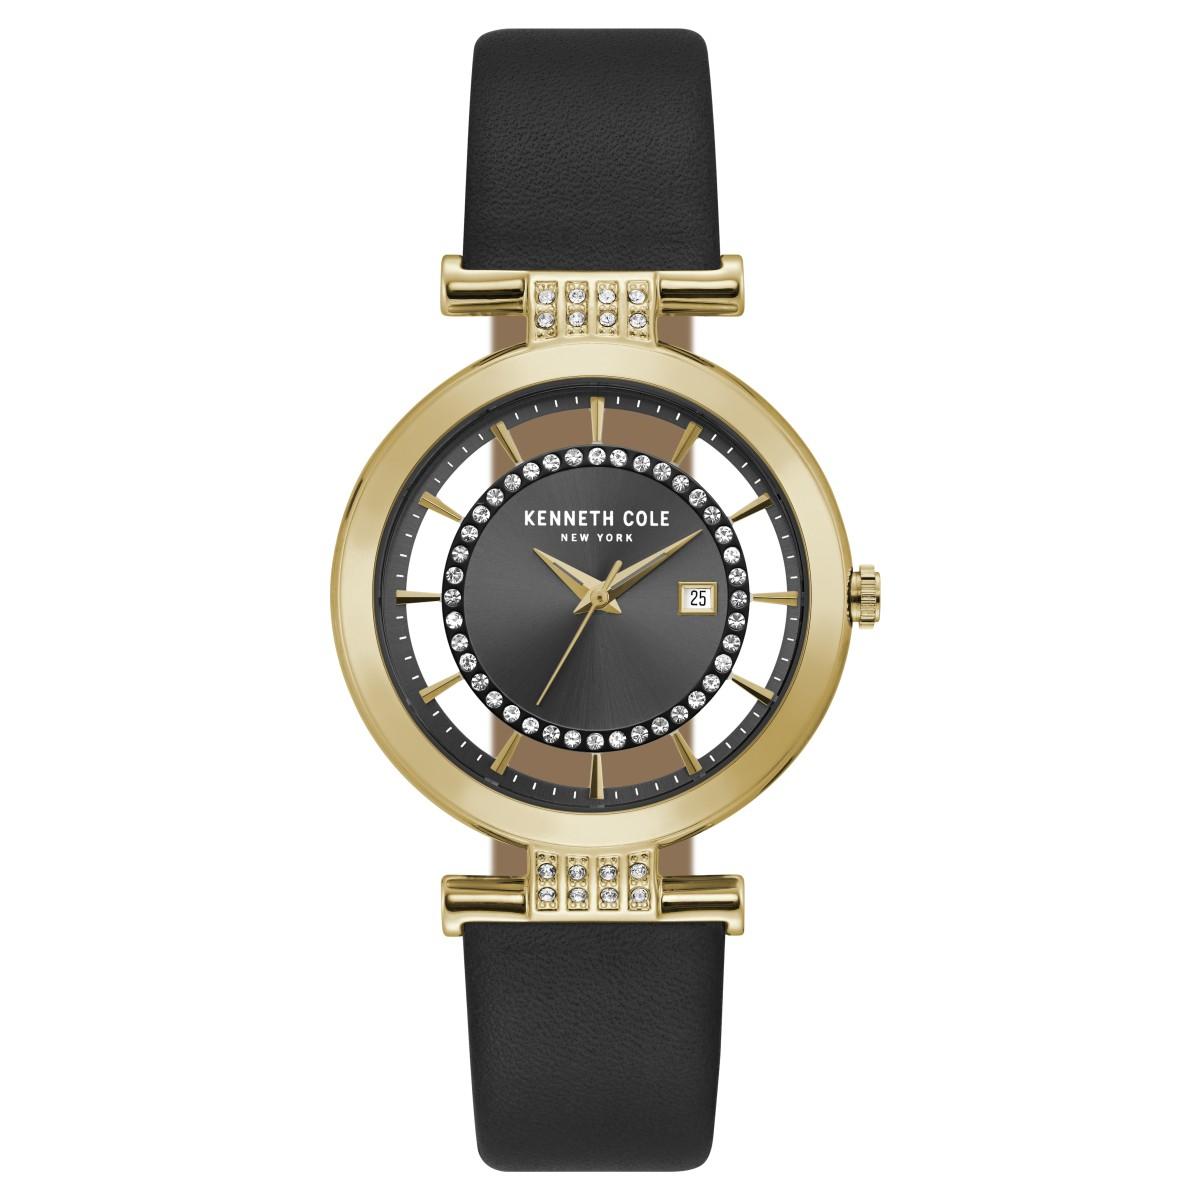 Kenneth-Cole-New-York-Damen-Armbanduhr-Analog-Quarz-Leder-KC15005008